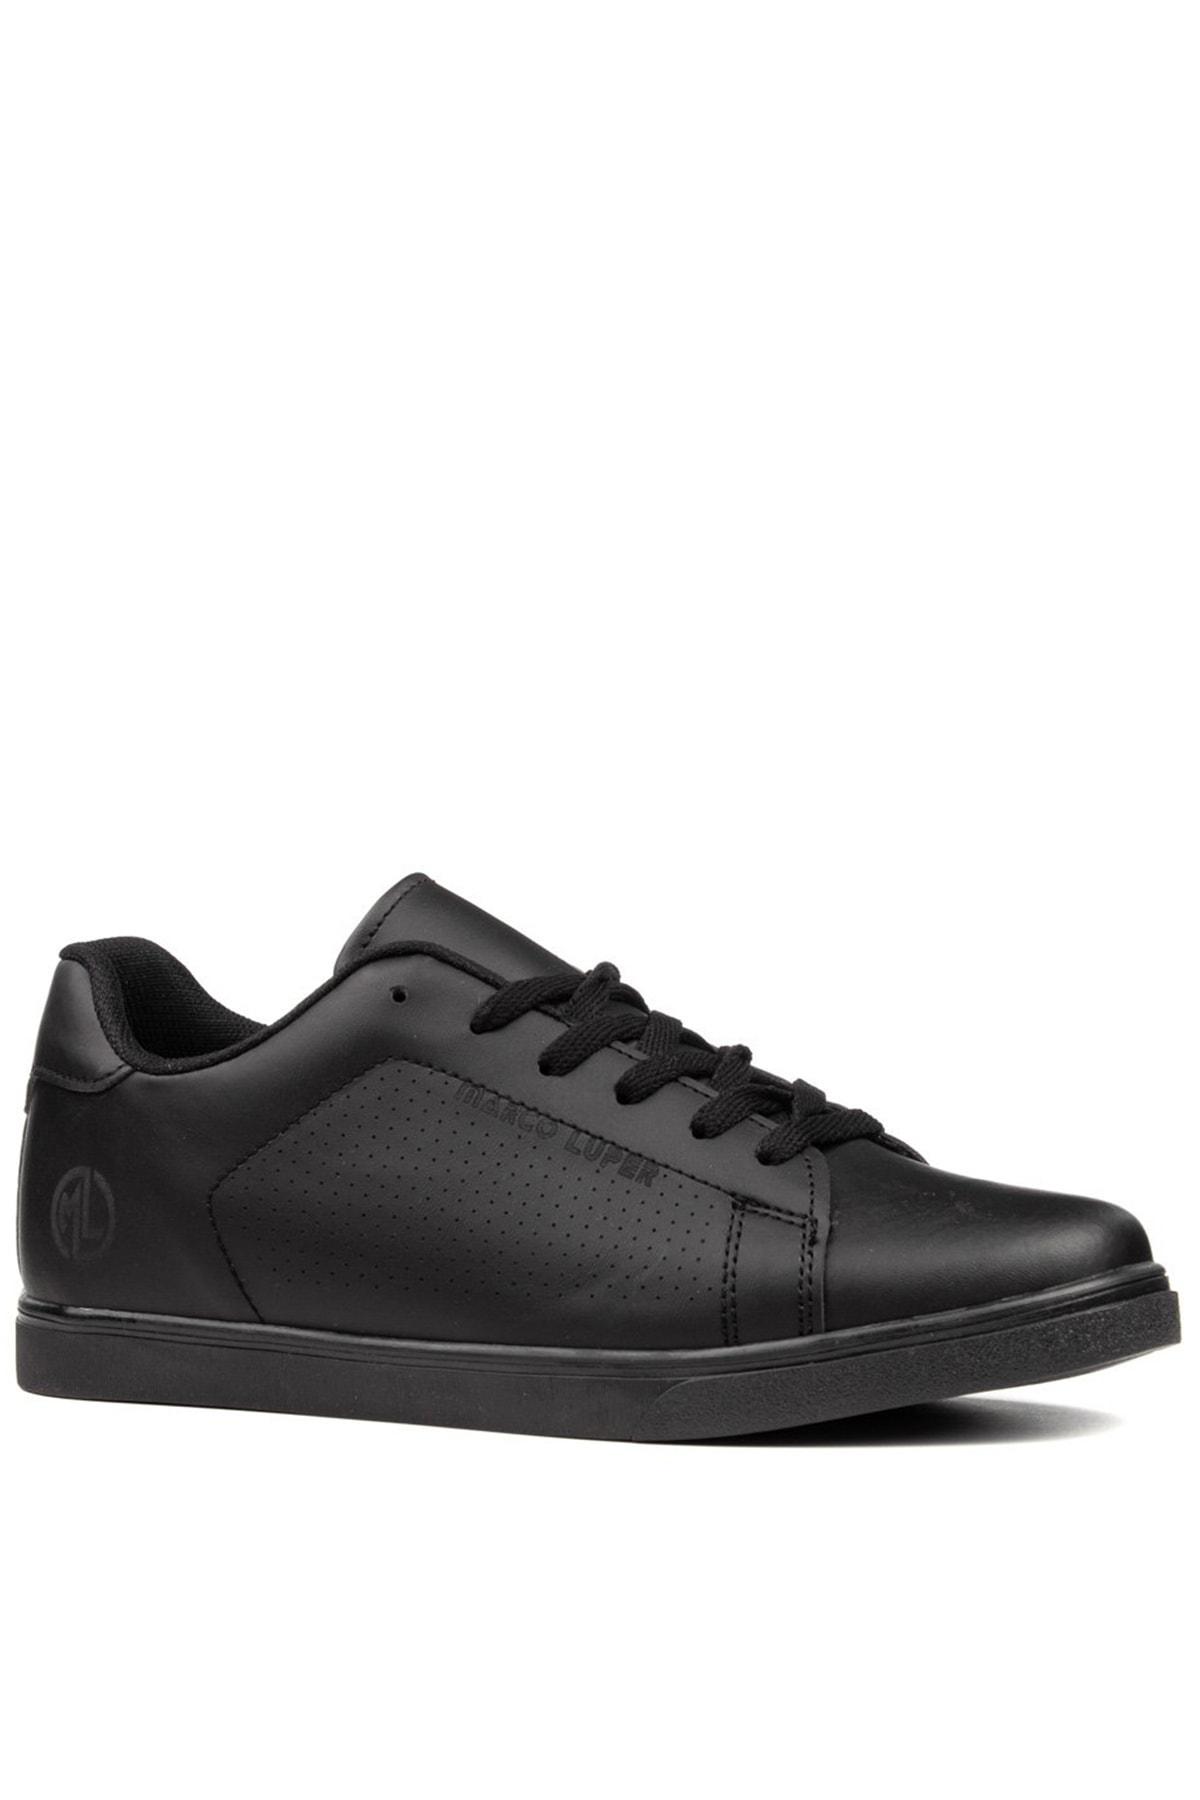 ICELAKE Kadın Siyah Sneaker Ysn01257kd00 2